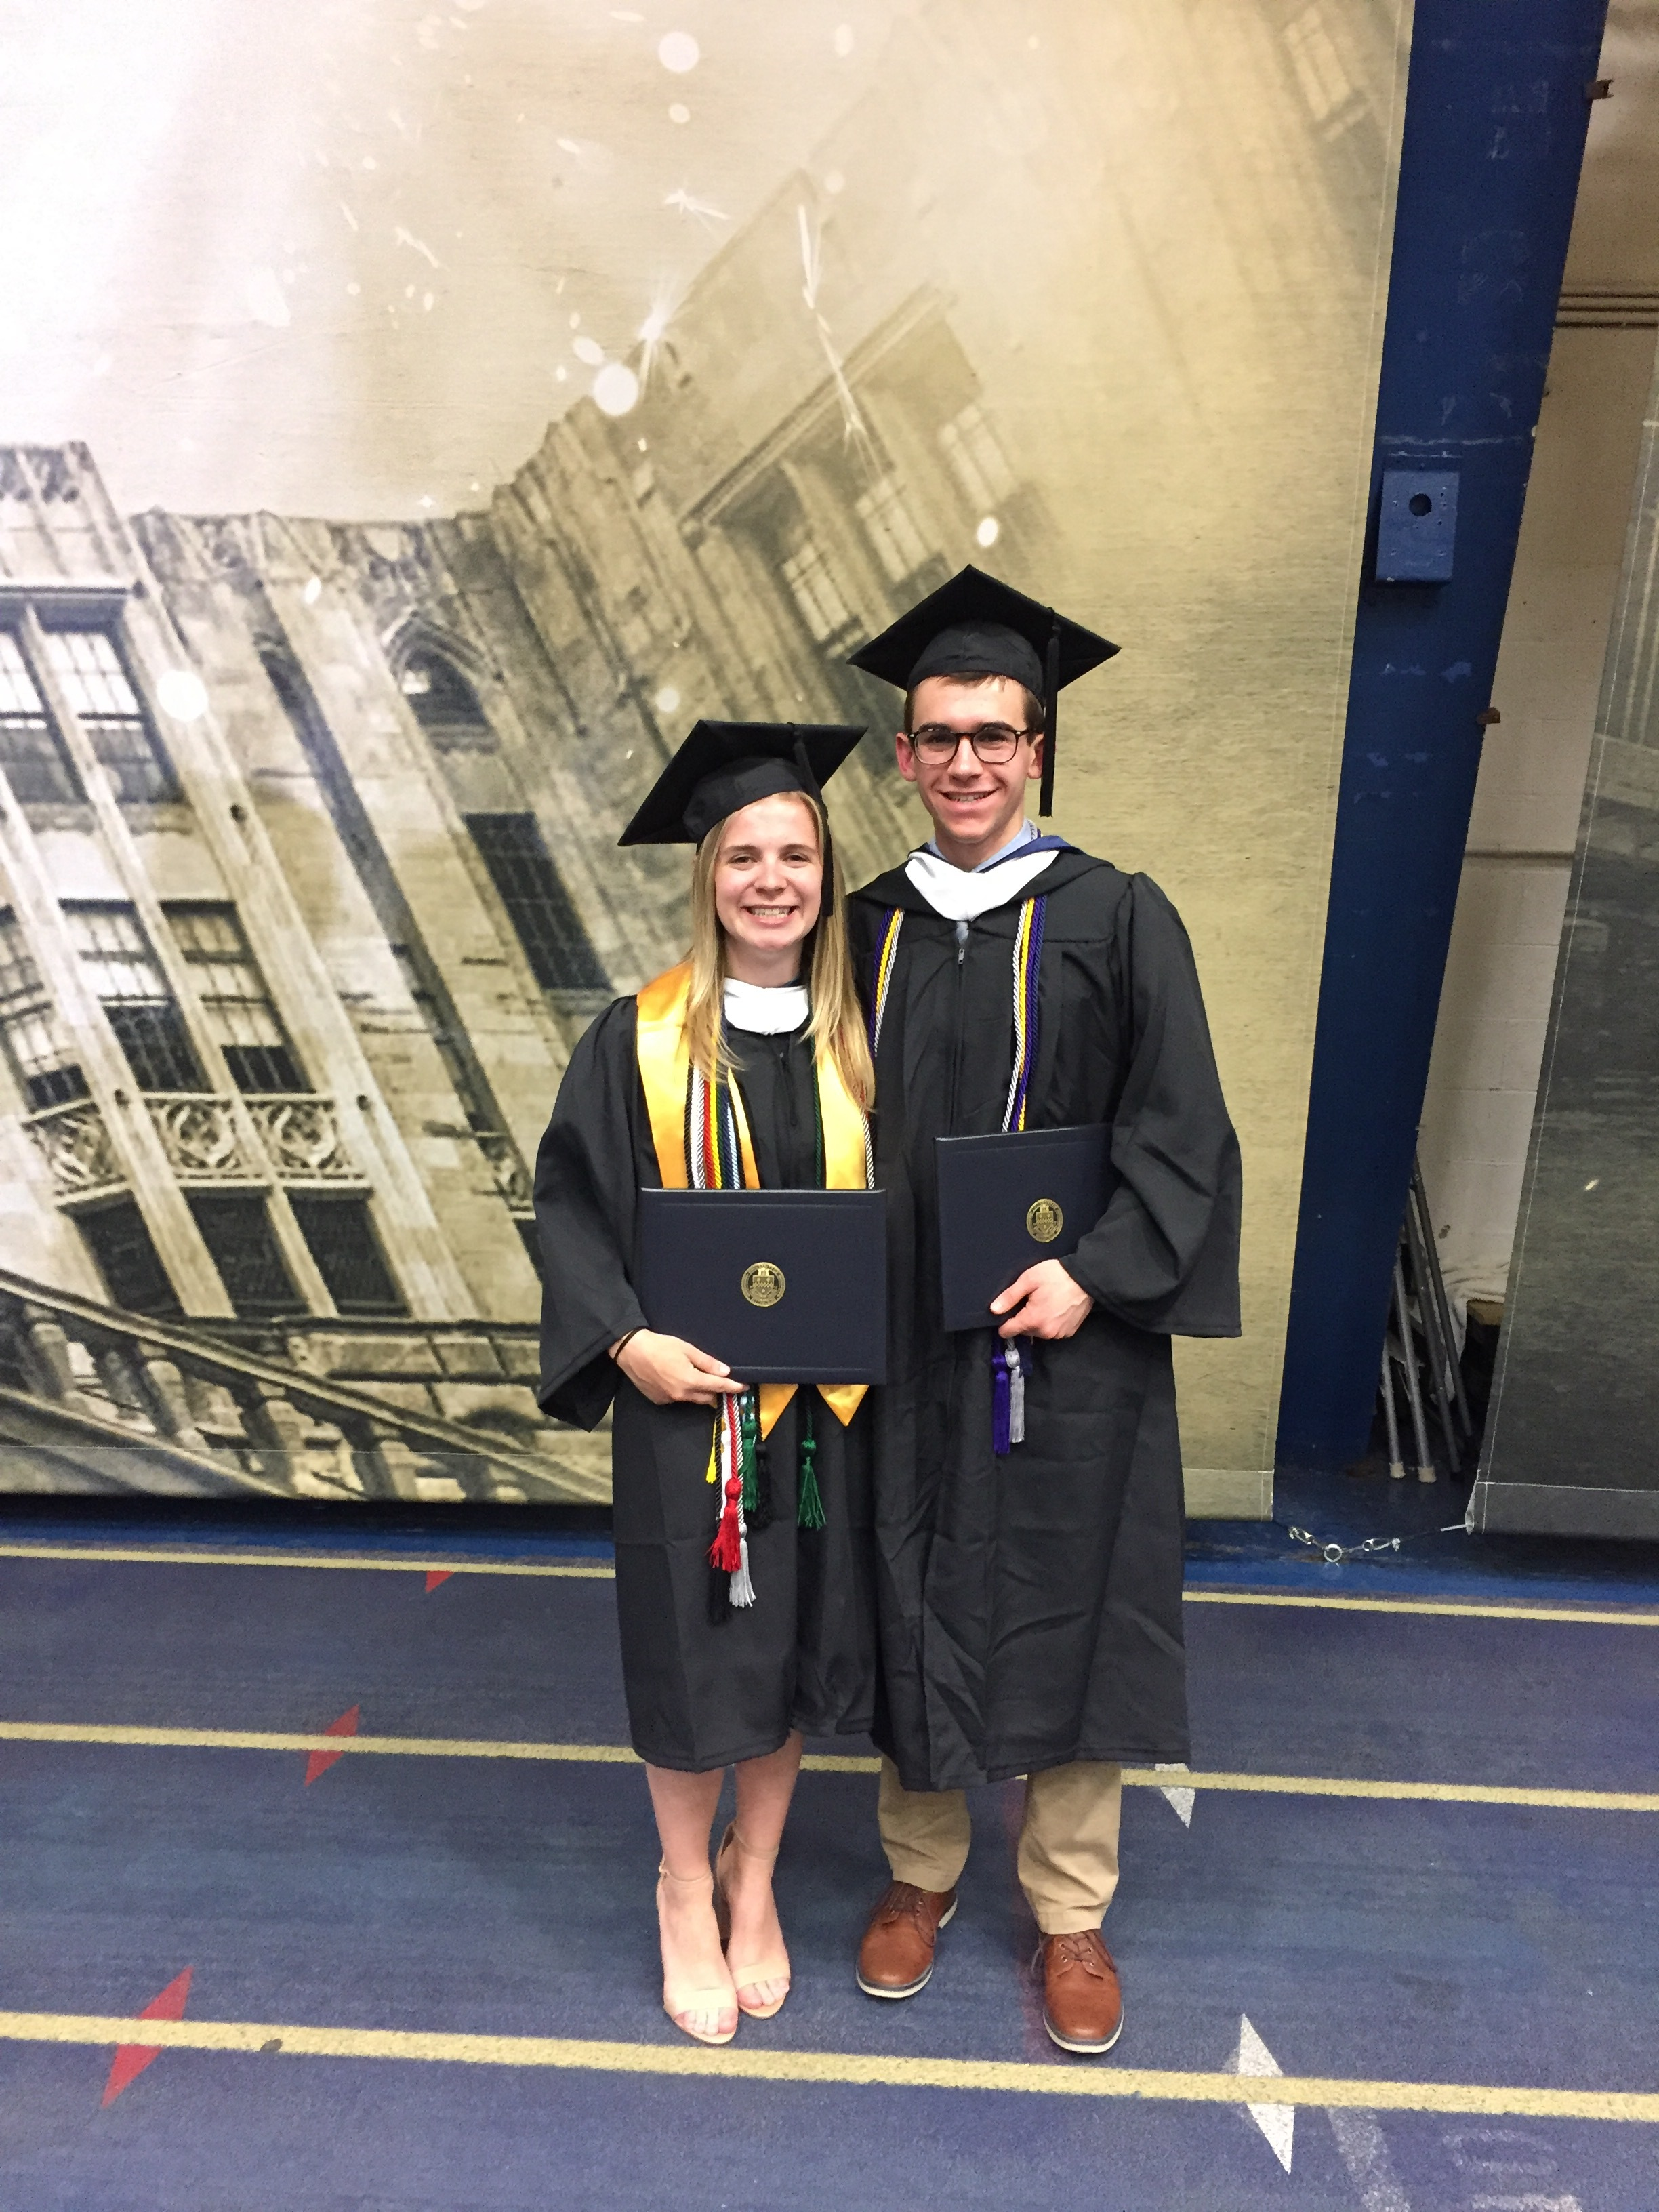 The recent graduates and Carlson lab alumni Monica and Ben